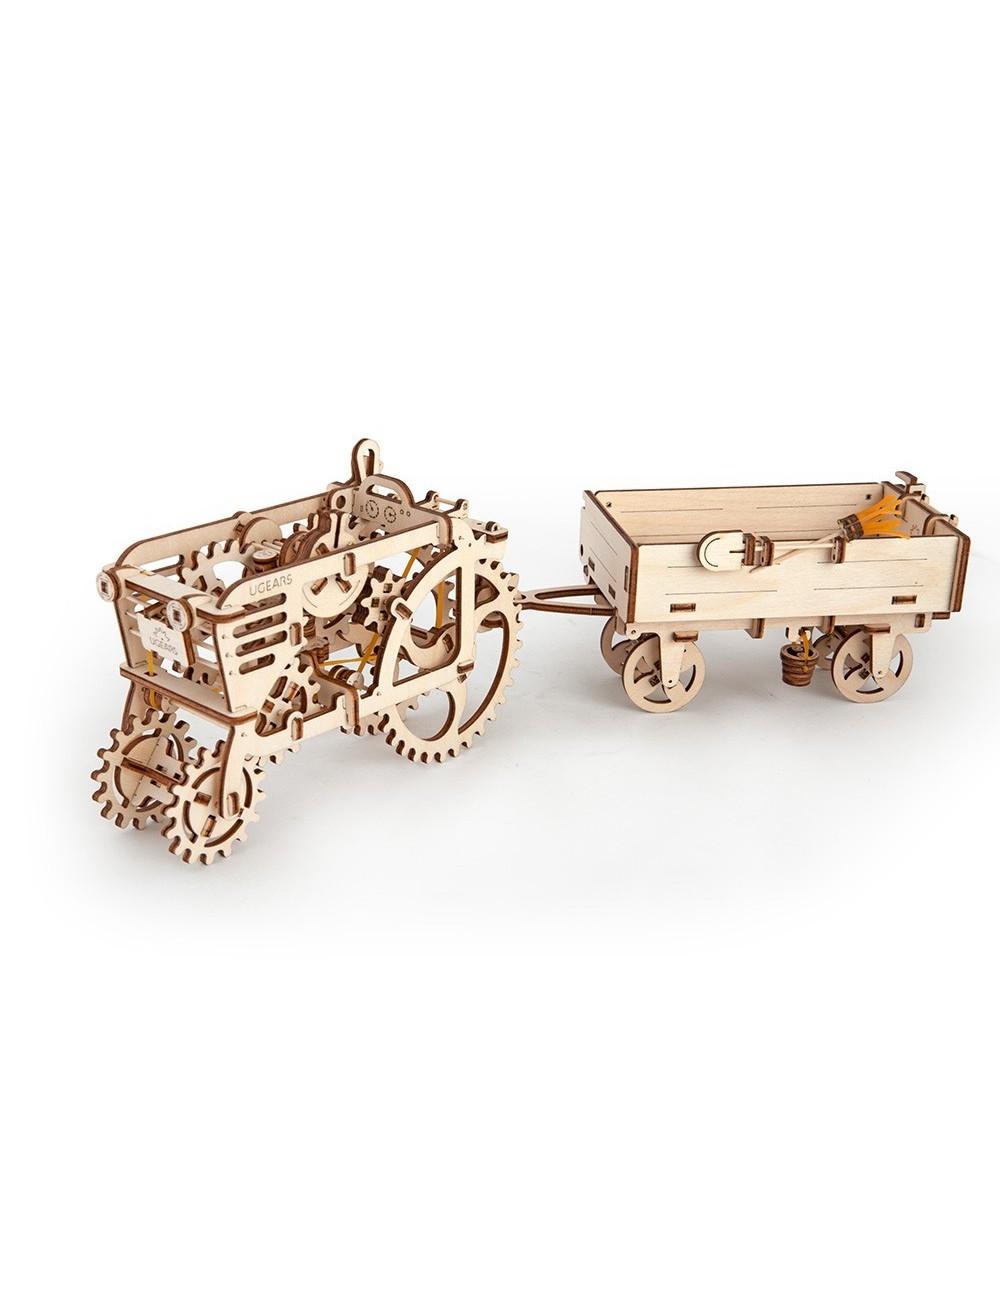 Tractor's trailer